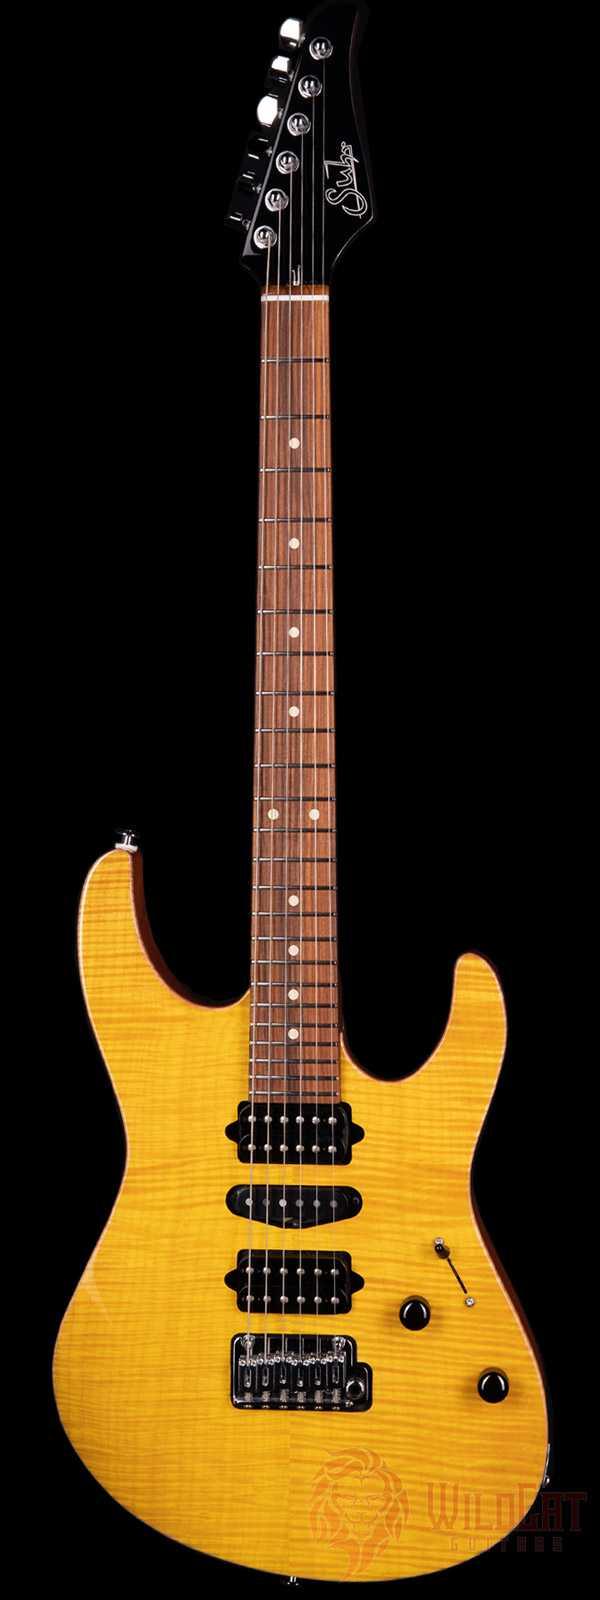 Suhr Custom Modern Flame Maple Top Khaya Neck Trans Lemon Yellow